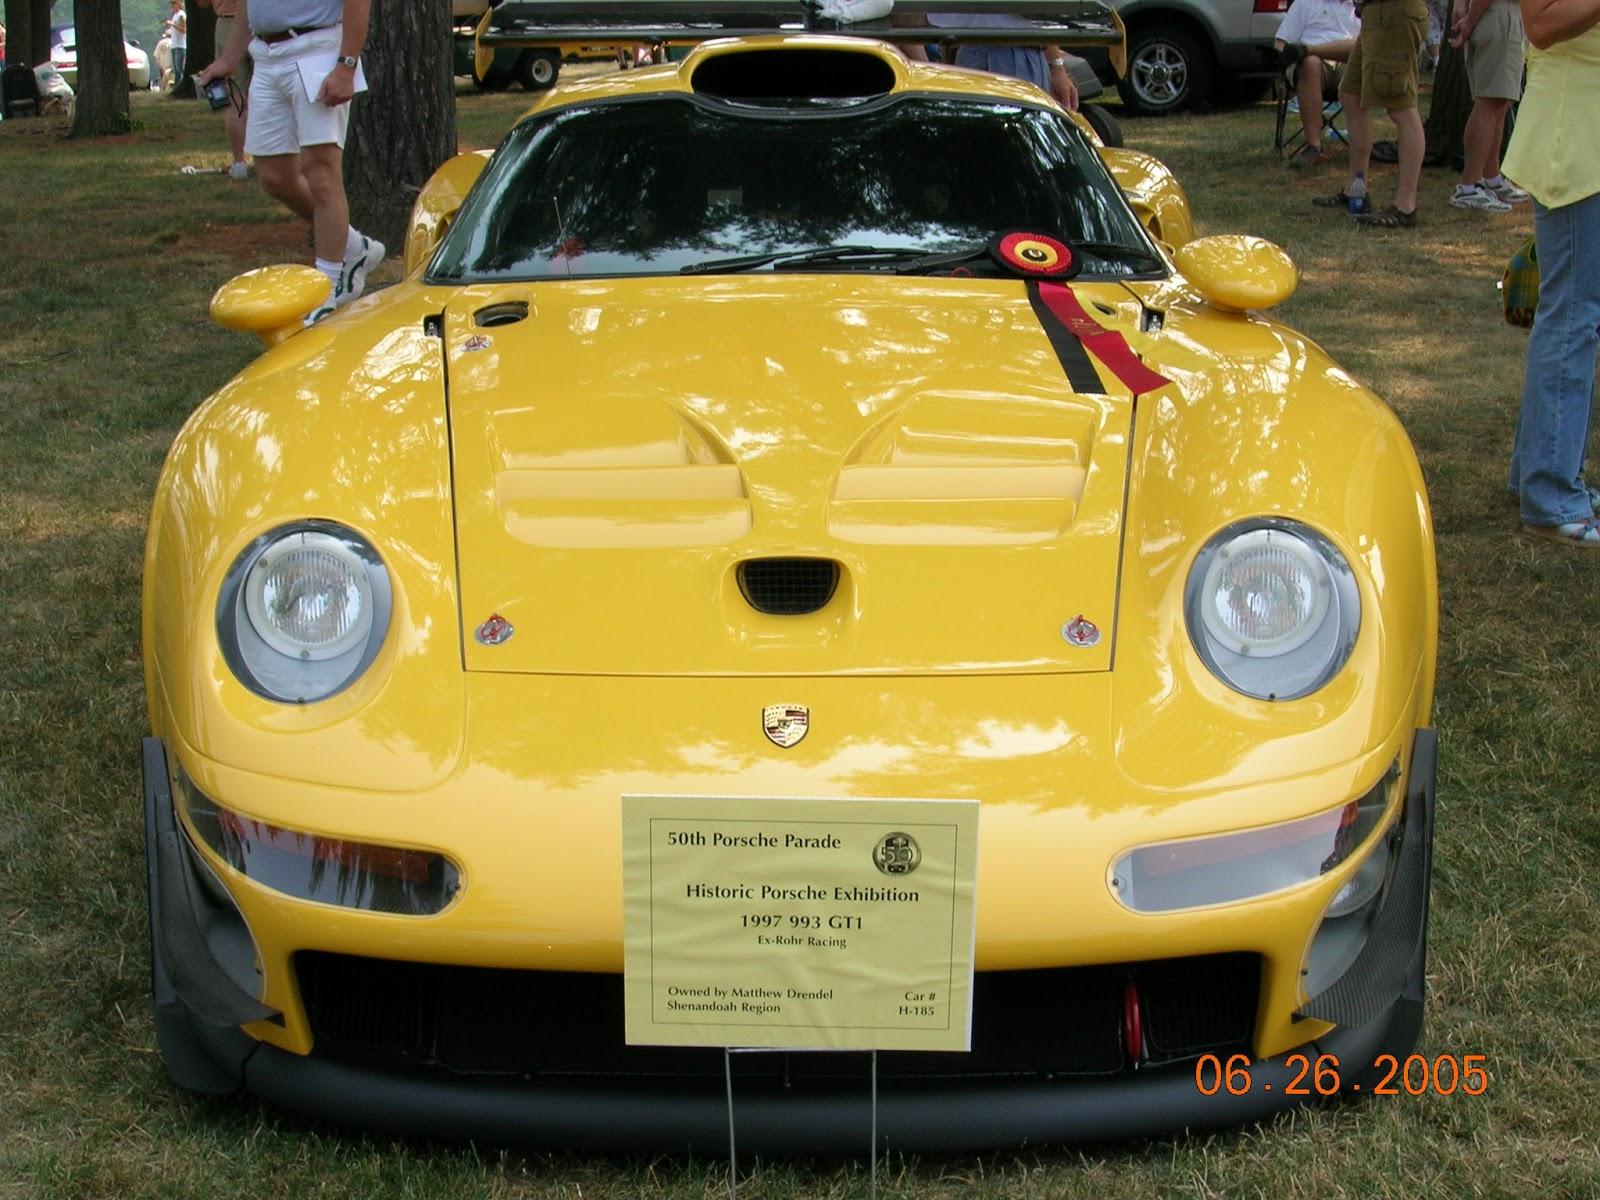 Porsche+993+GT1+Front Wonderful 1998 Porsche 911 Gt1 Specs Cars Trend